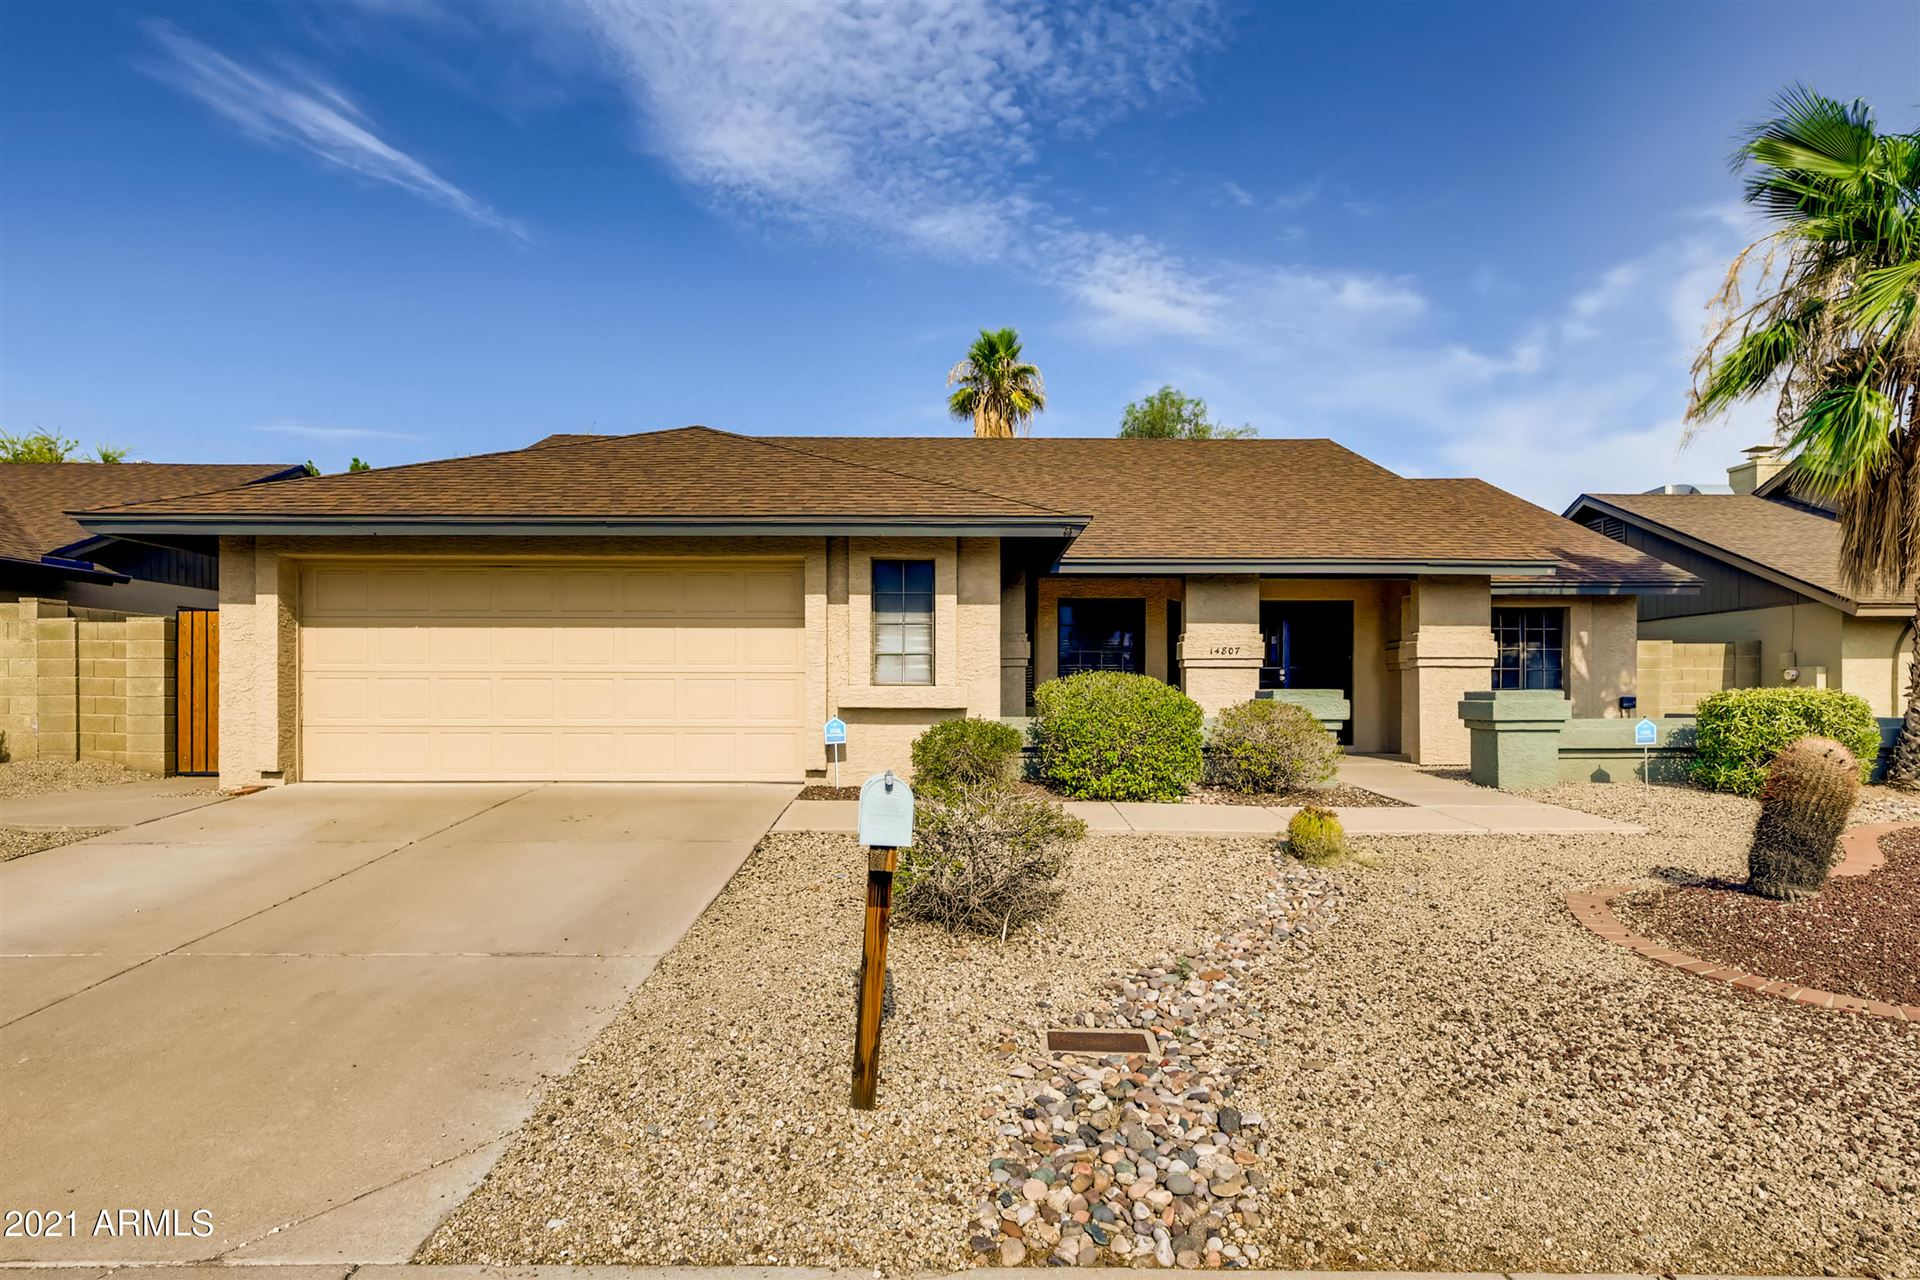 14807 N 58TH Street, Scottsdale, AZ 85254 - MLS#: 6264441